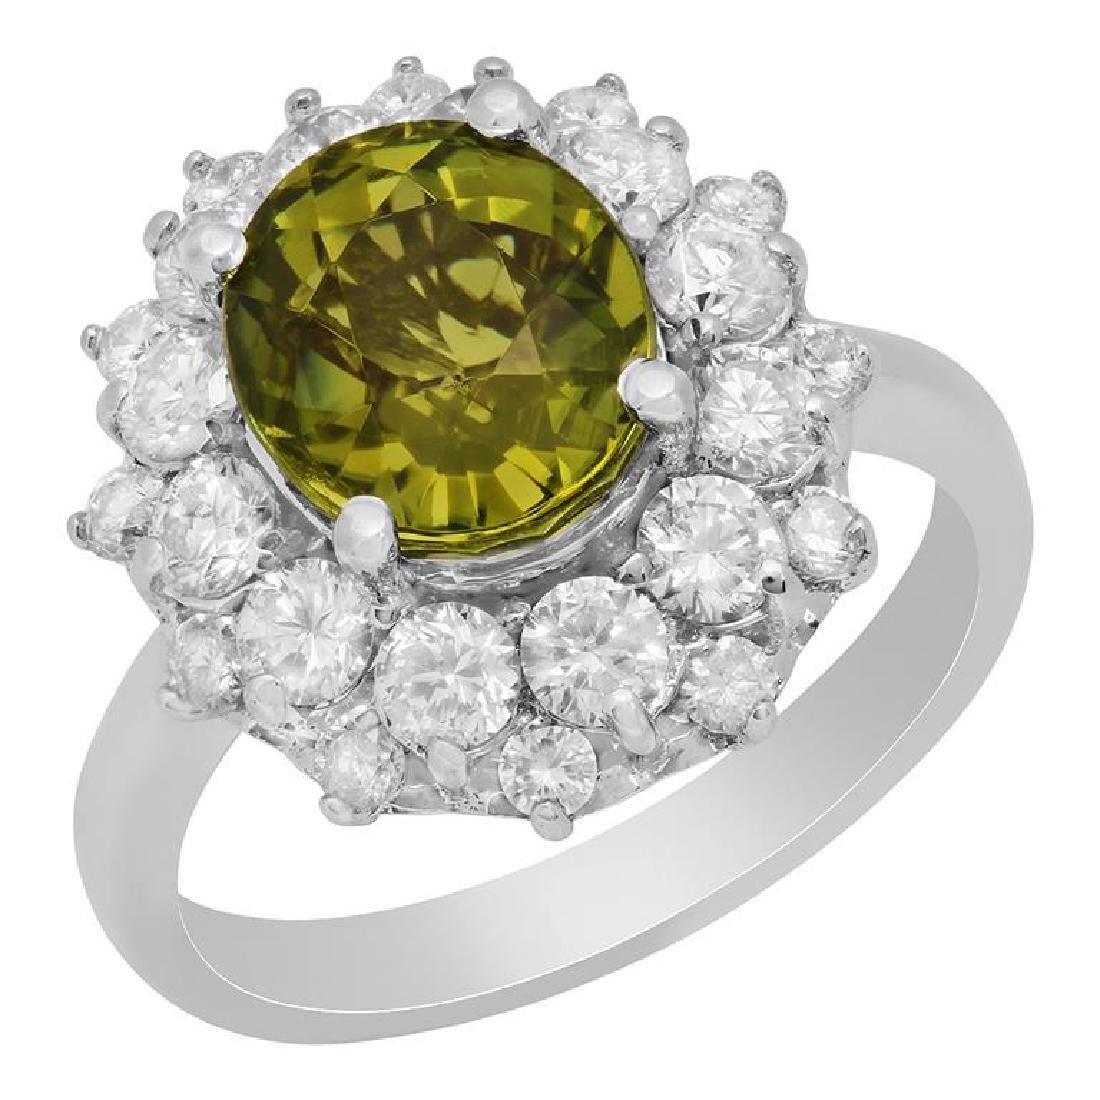 14k White Gold 3.57ct Green Tourmaline 1.53ct Diamond